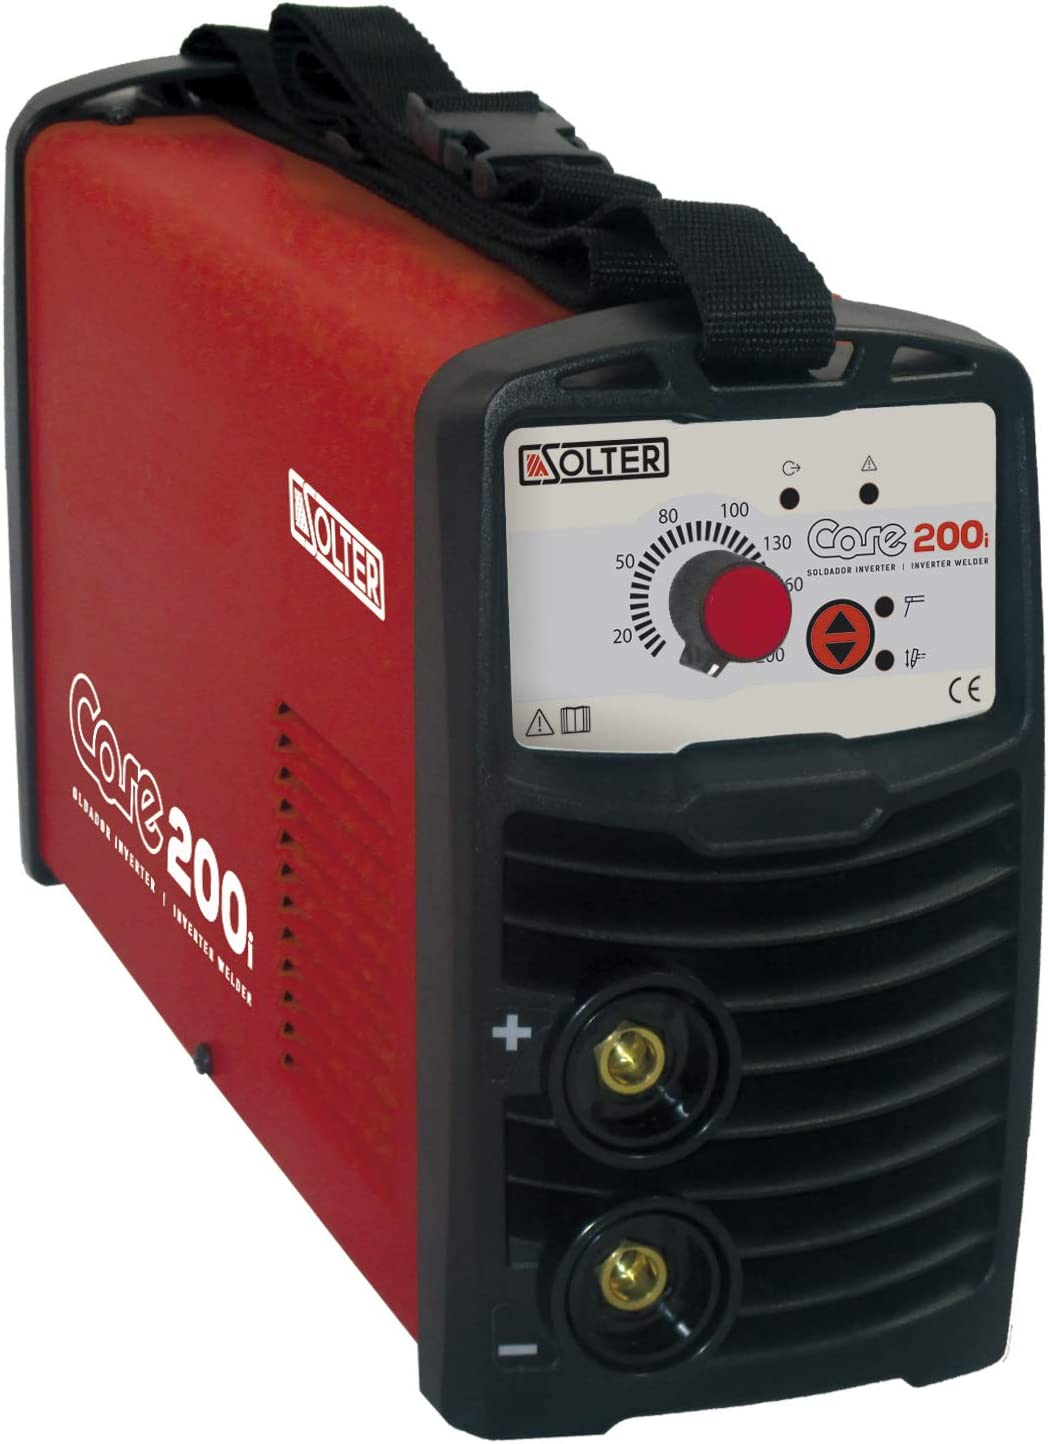 Solter 1 INVERTER CORE-200i, Rojo